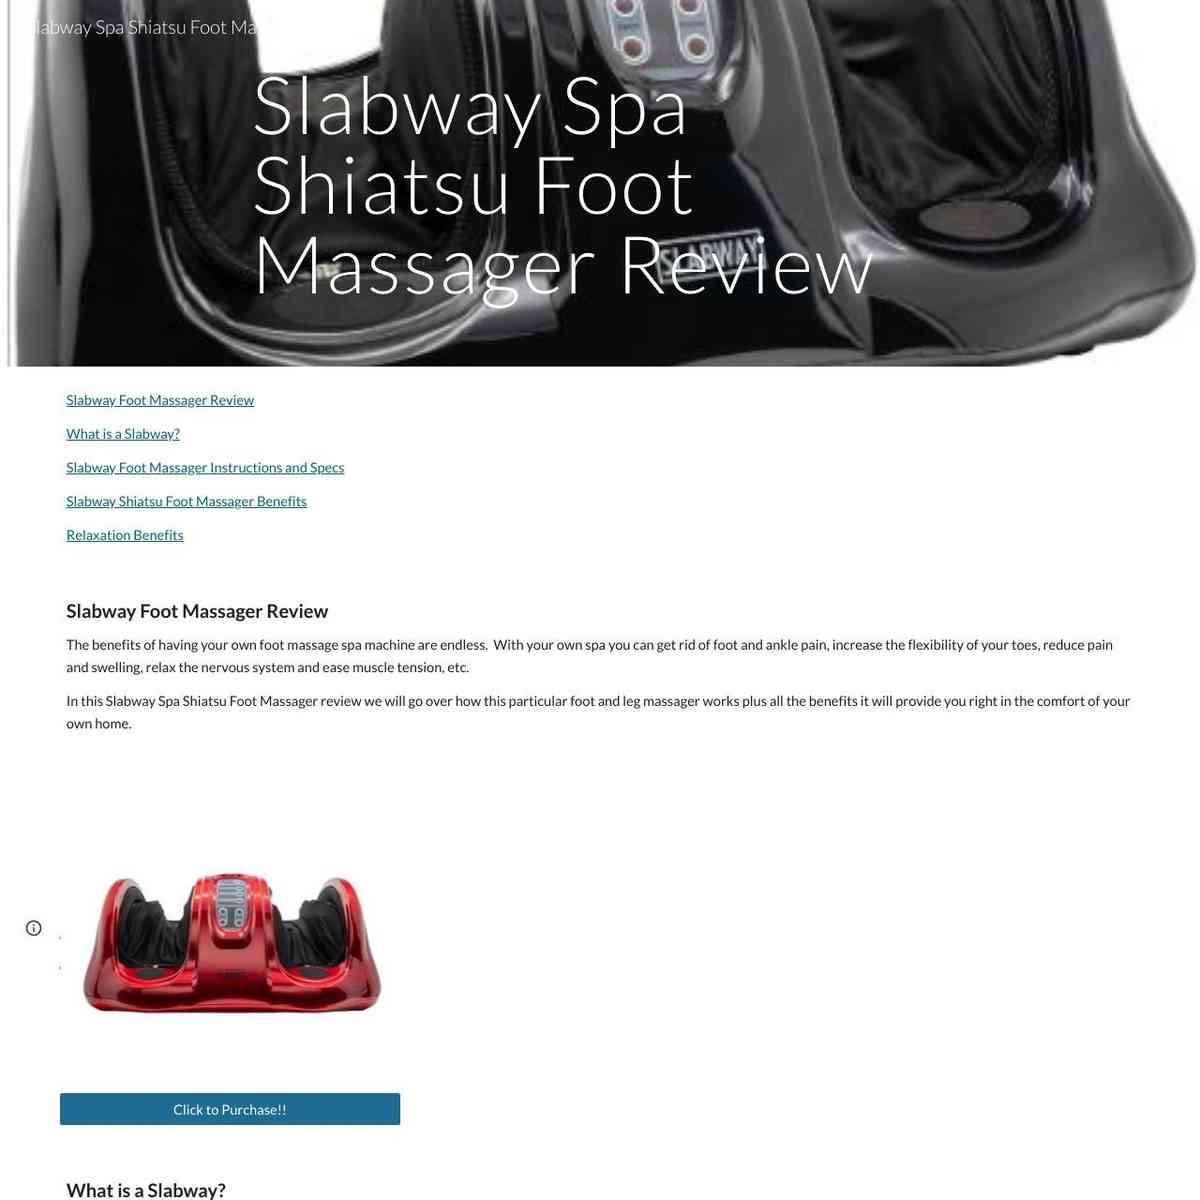 Slabway Spa Shiatsu Massager Review